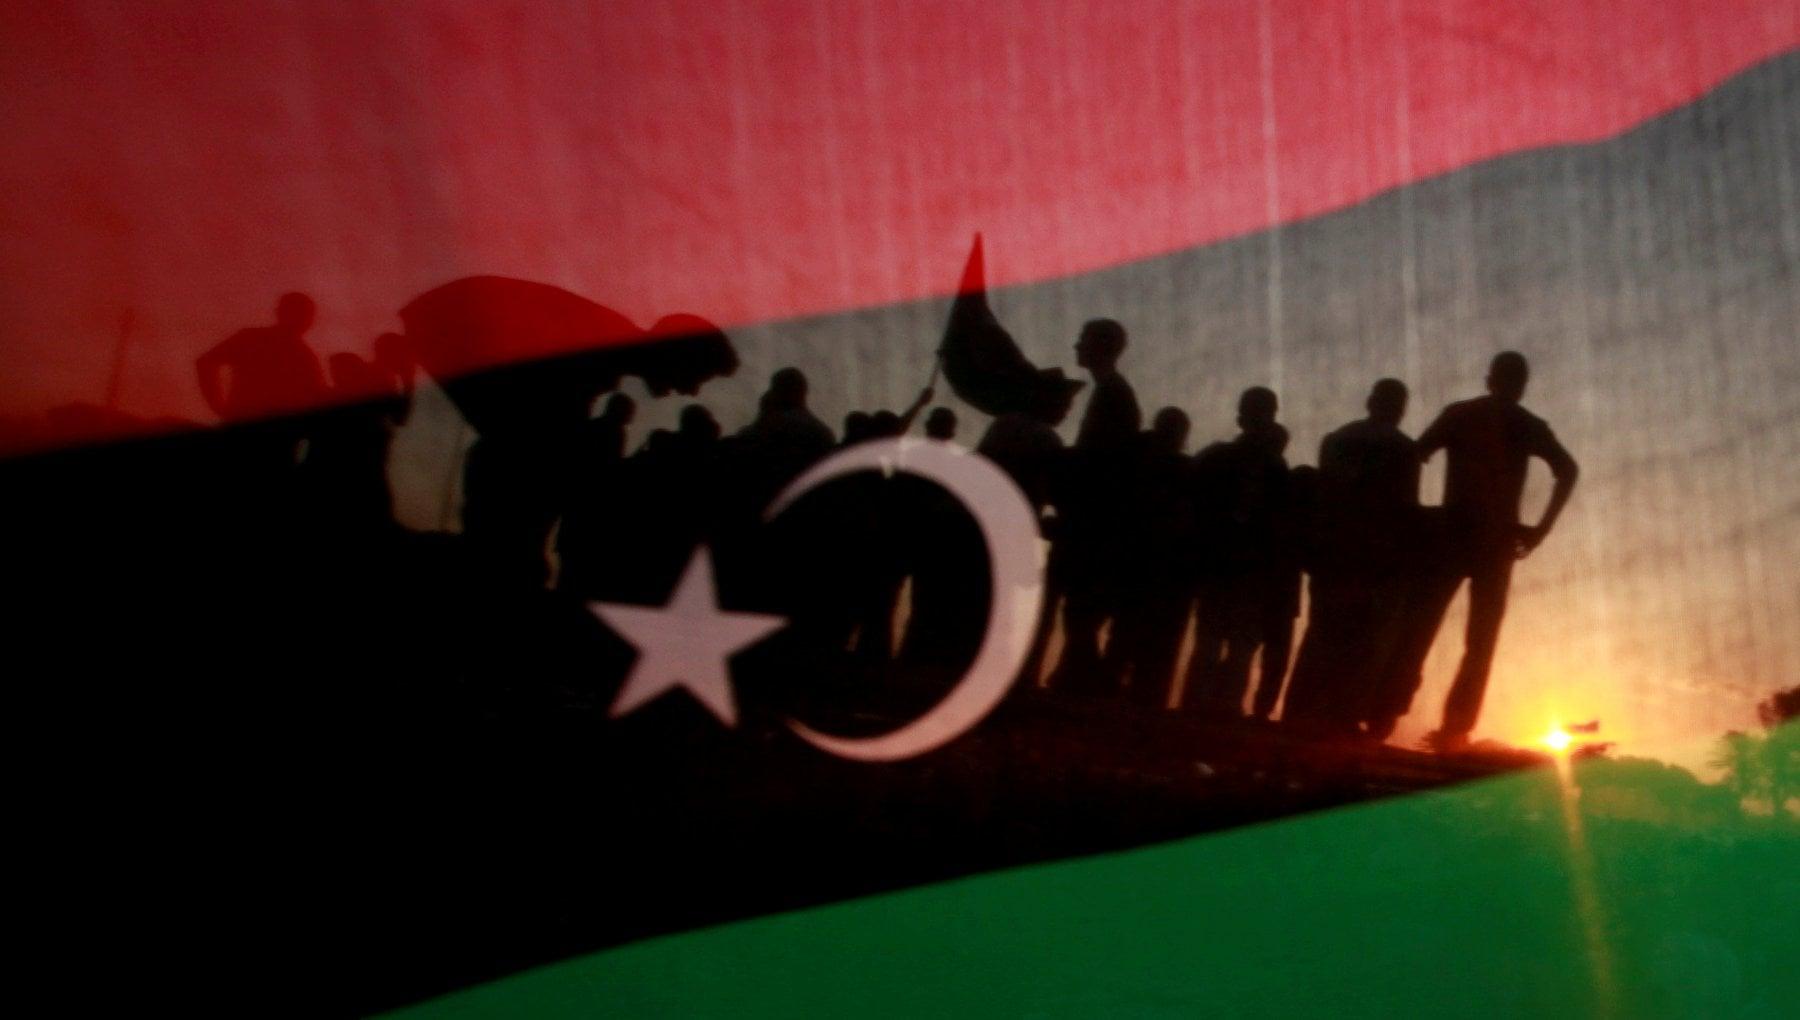 "103345133 adec8167 d583 472f 8de7 225a34178691 - Libia, ""la guerra dei figli di"": grandi manovre per candidare Saif el Islam Gheddafi. L'ira di Haftar junior"